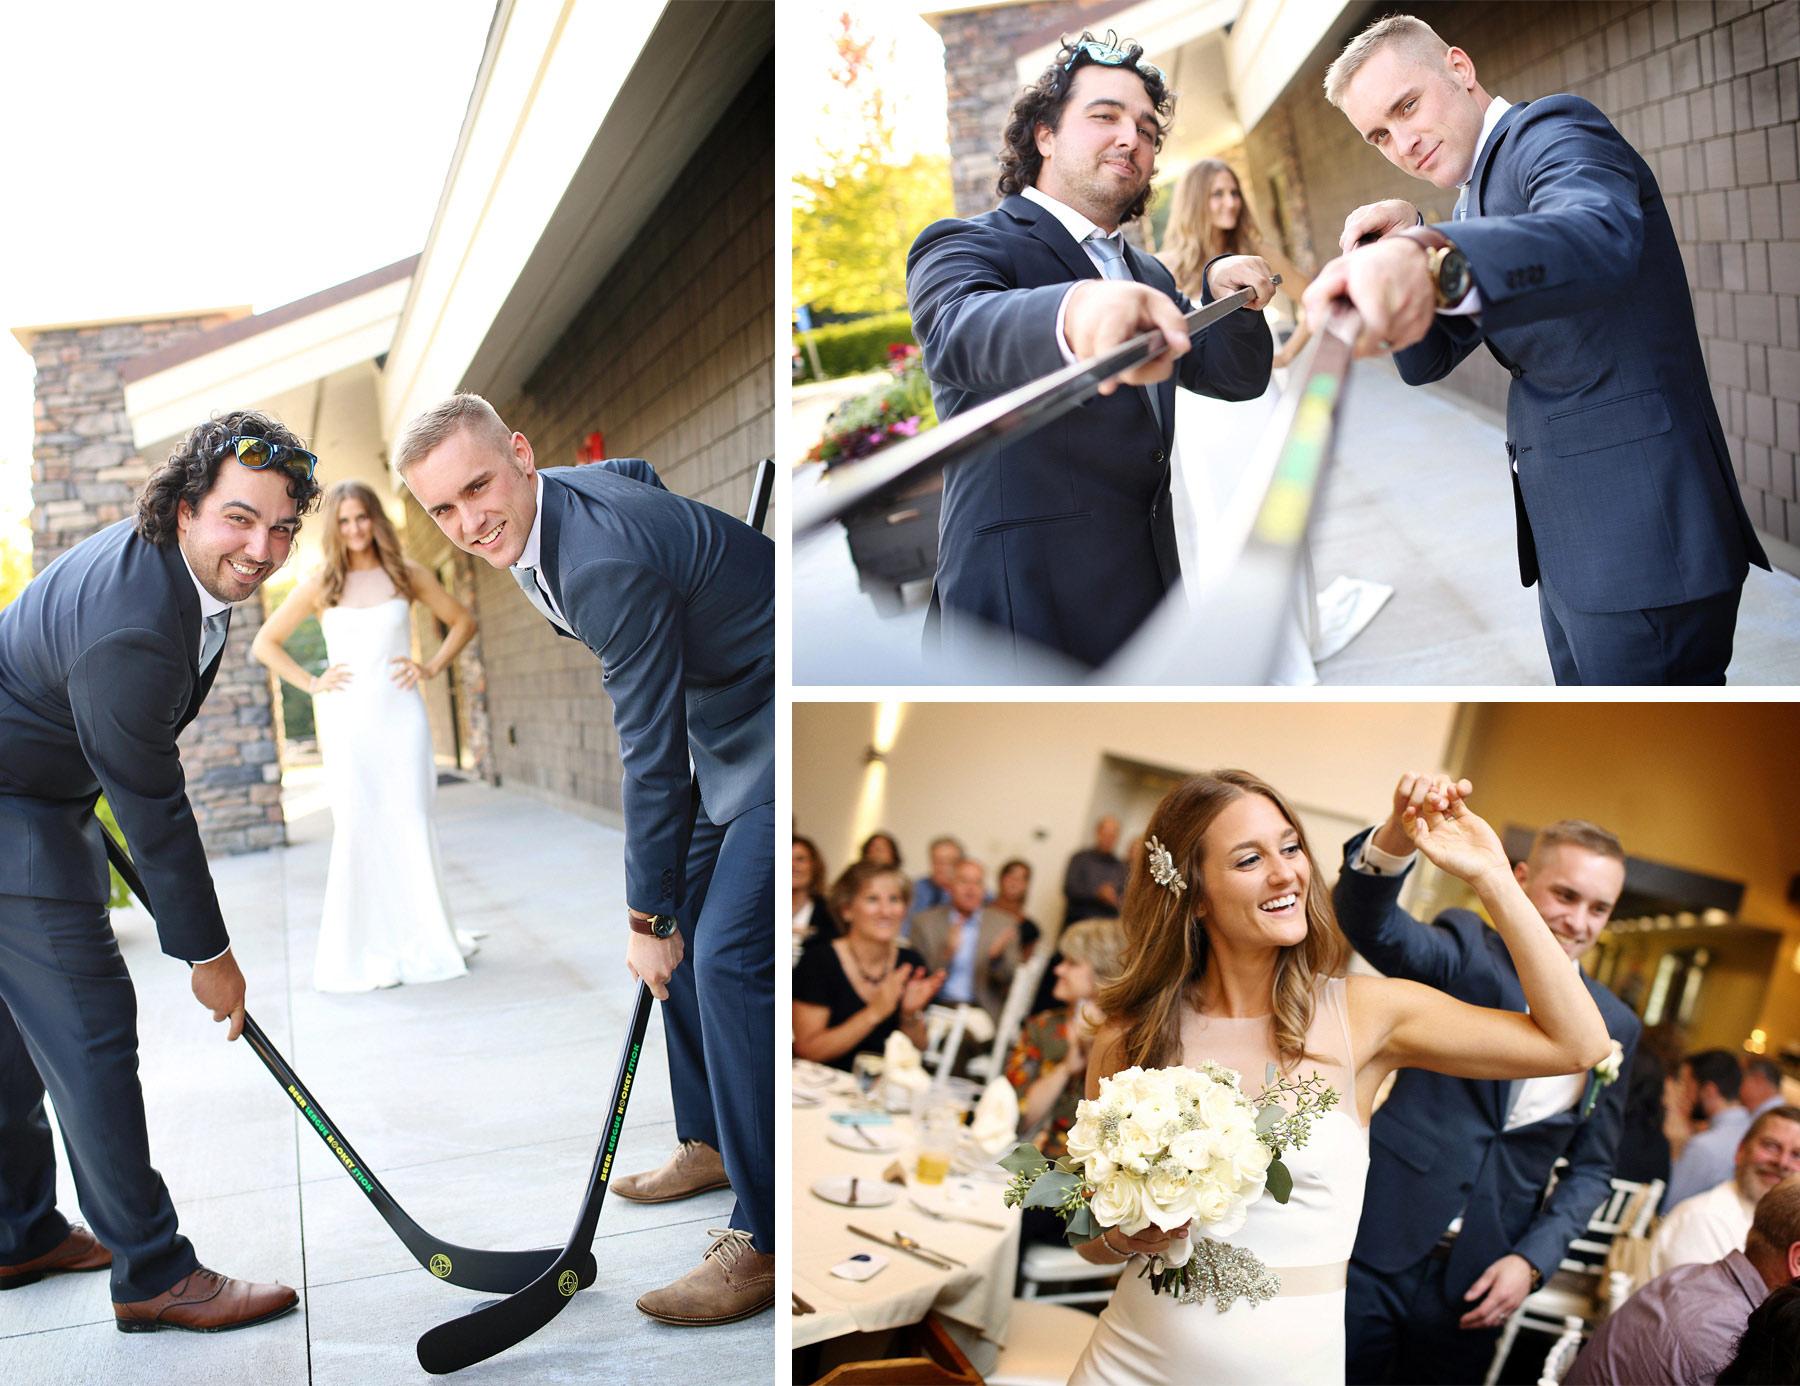 20-Dellwood-Minnesota-Wedding-Photographer-by-Andrew-Vick-Photography-Summer-Country-Club-Reception-Bride-Groom-Grand-March-Hockey-Sticks-Groomsmen-Sarah-and-Landon.jpg